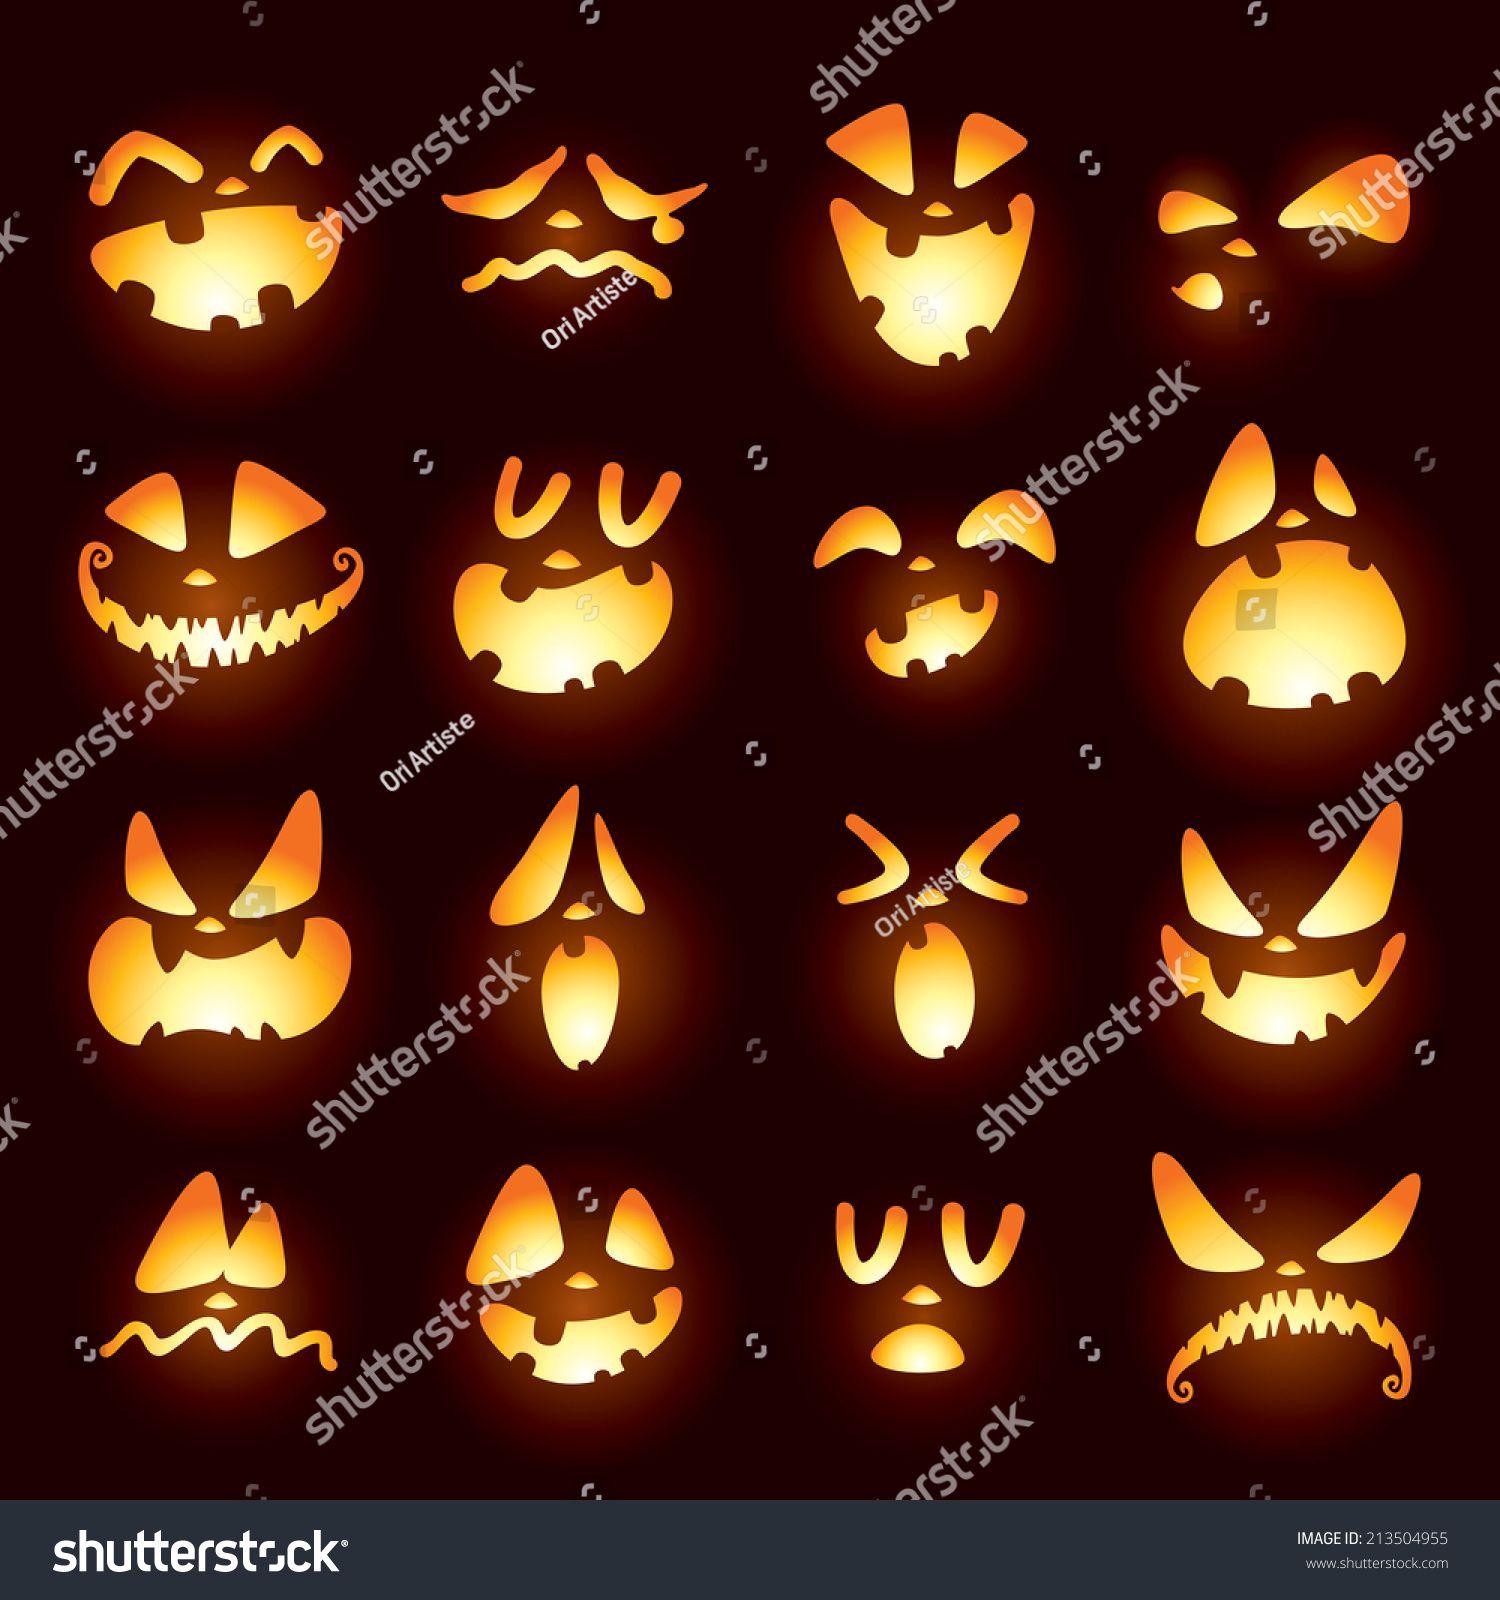 jack o lantern faces halloween pinterest halloween halloween ideen und halloween k rbis. Black Bedroom Furniture Sets. Home Design Ideas